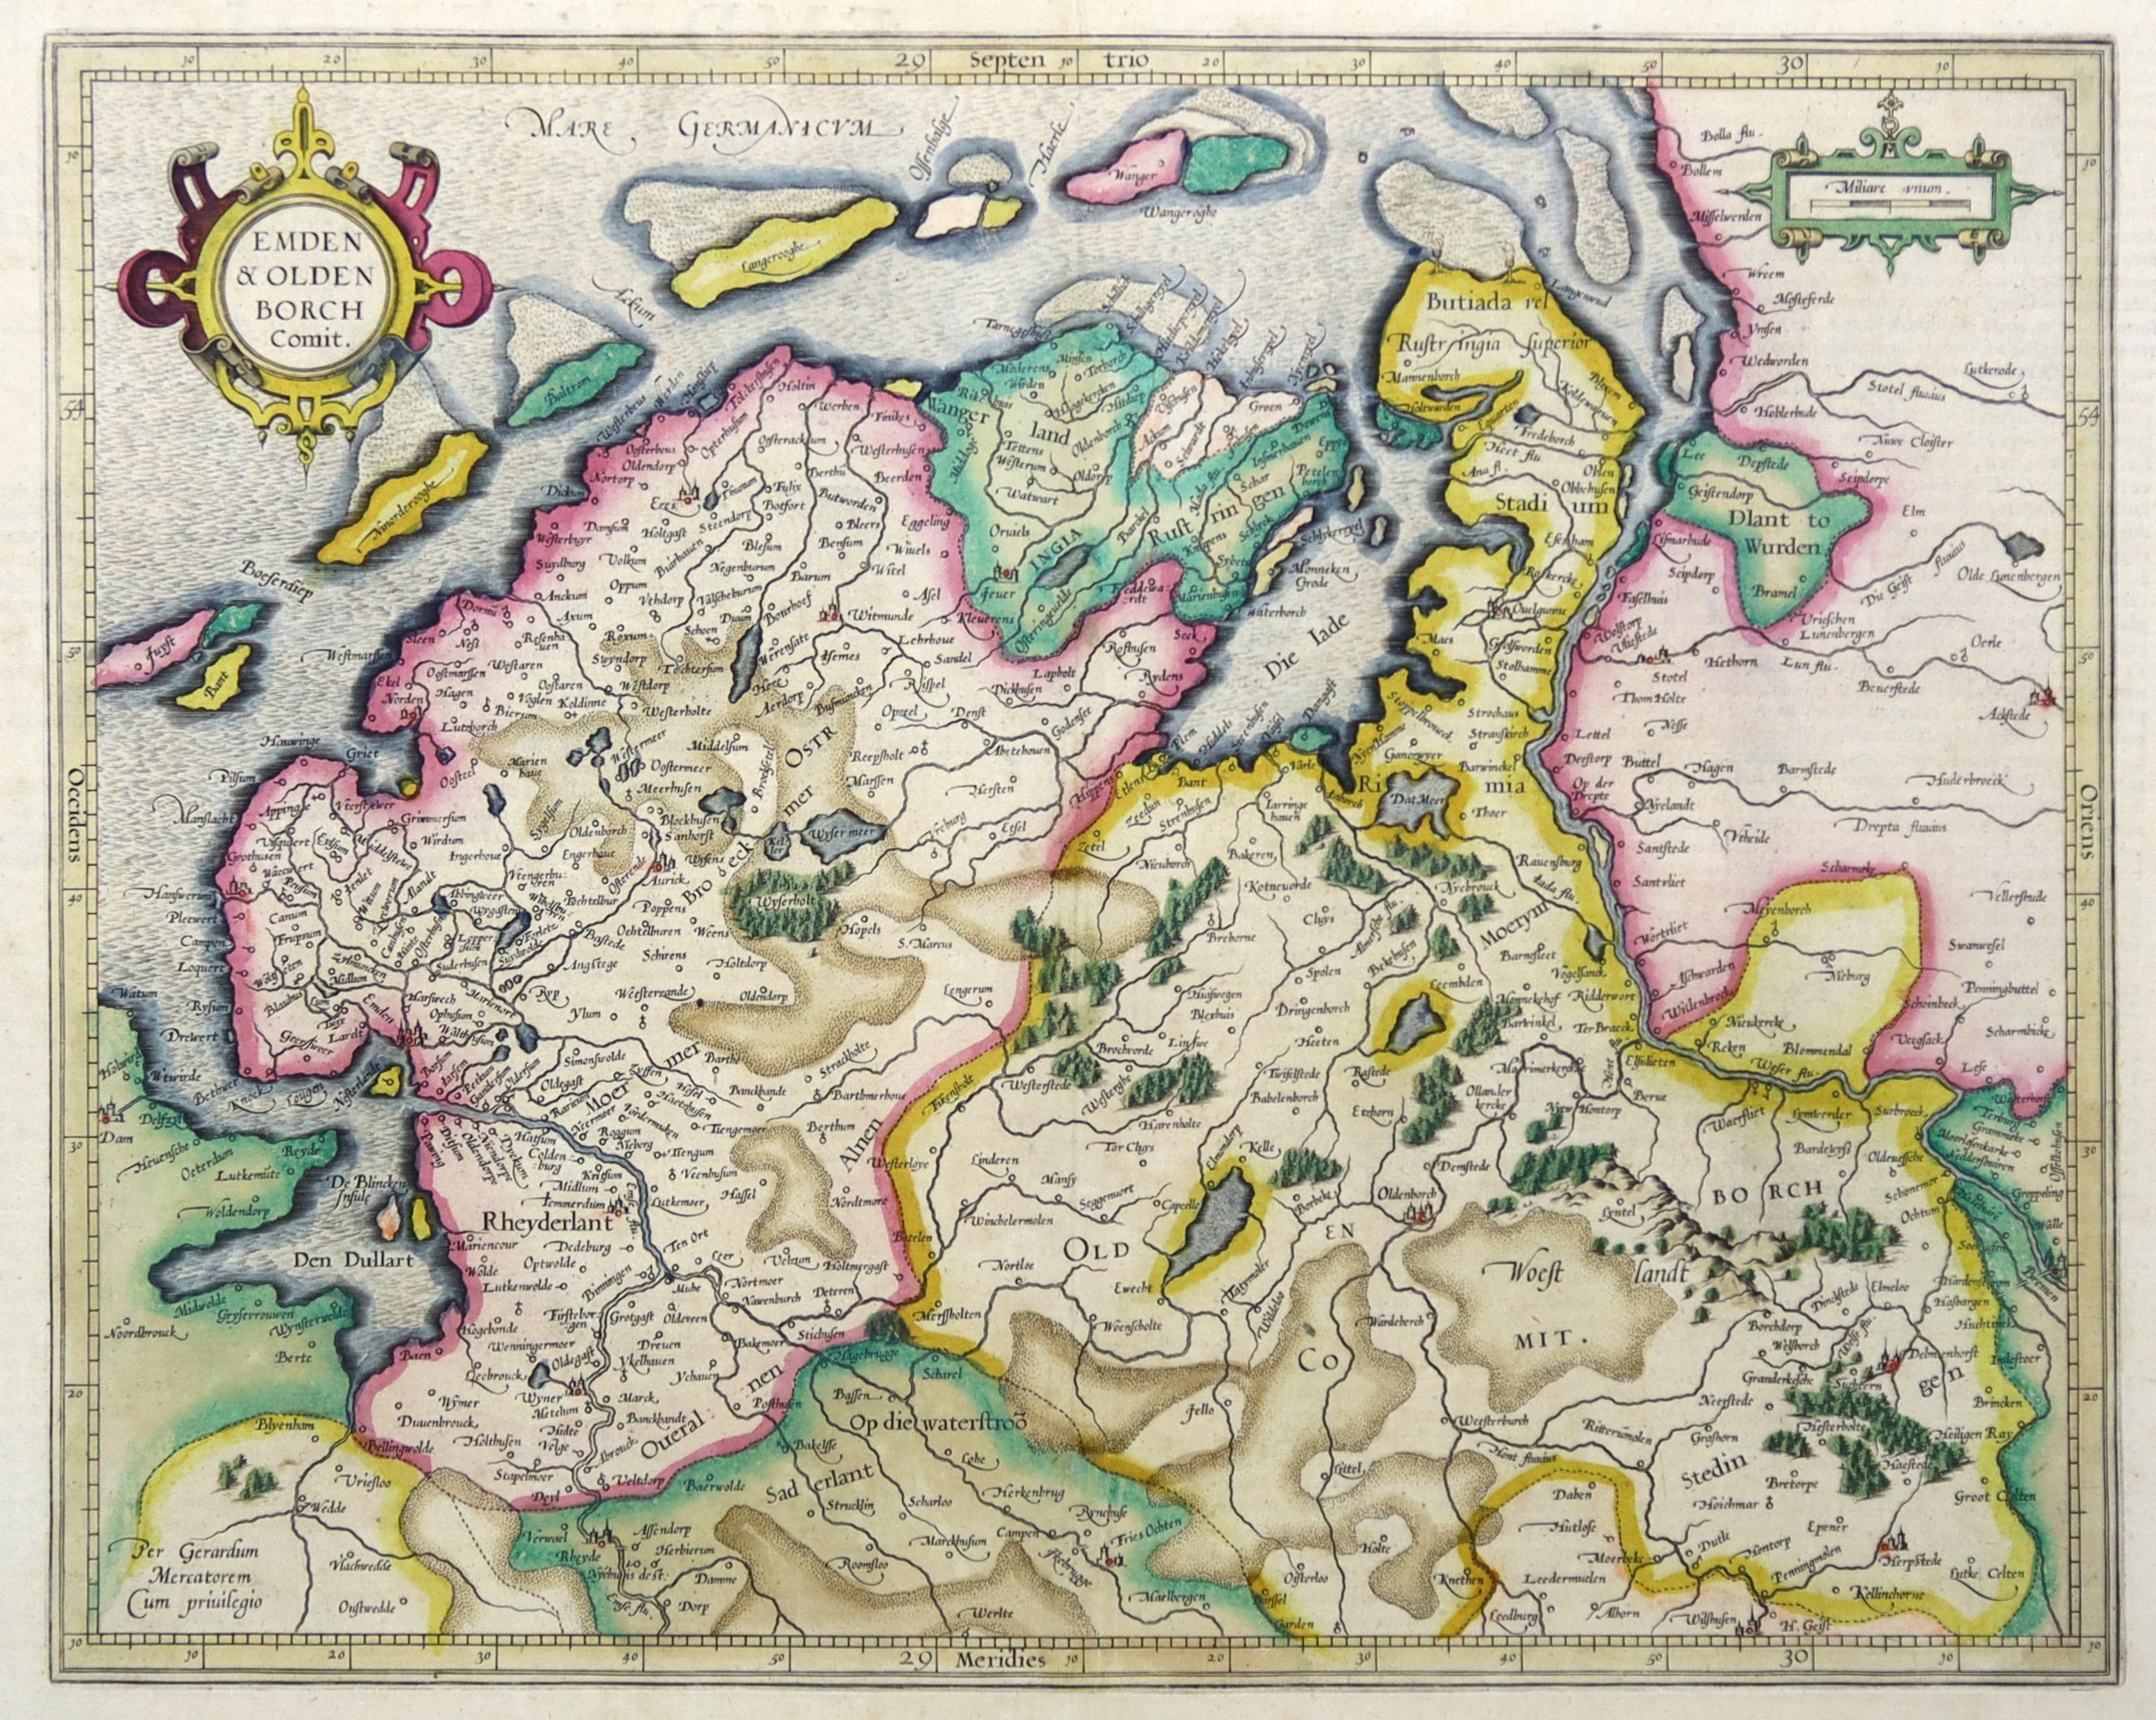 Emden Karte.Kupferstich Karte N Mercator B Hondius